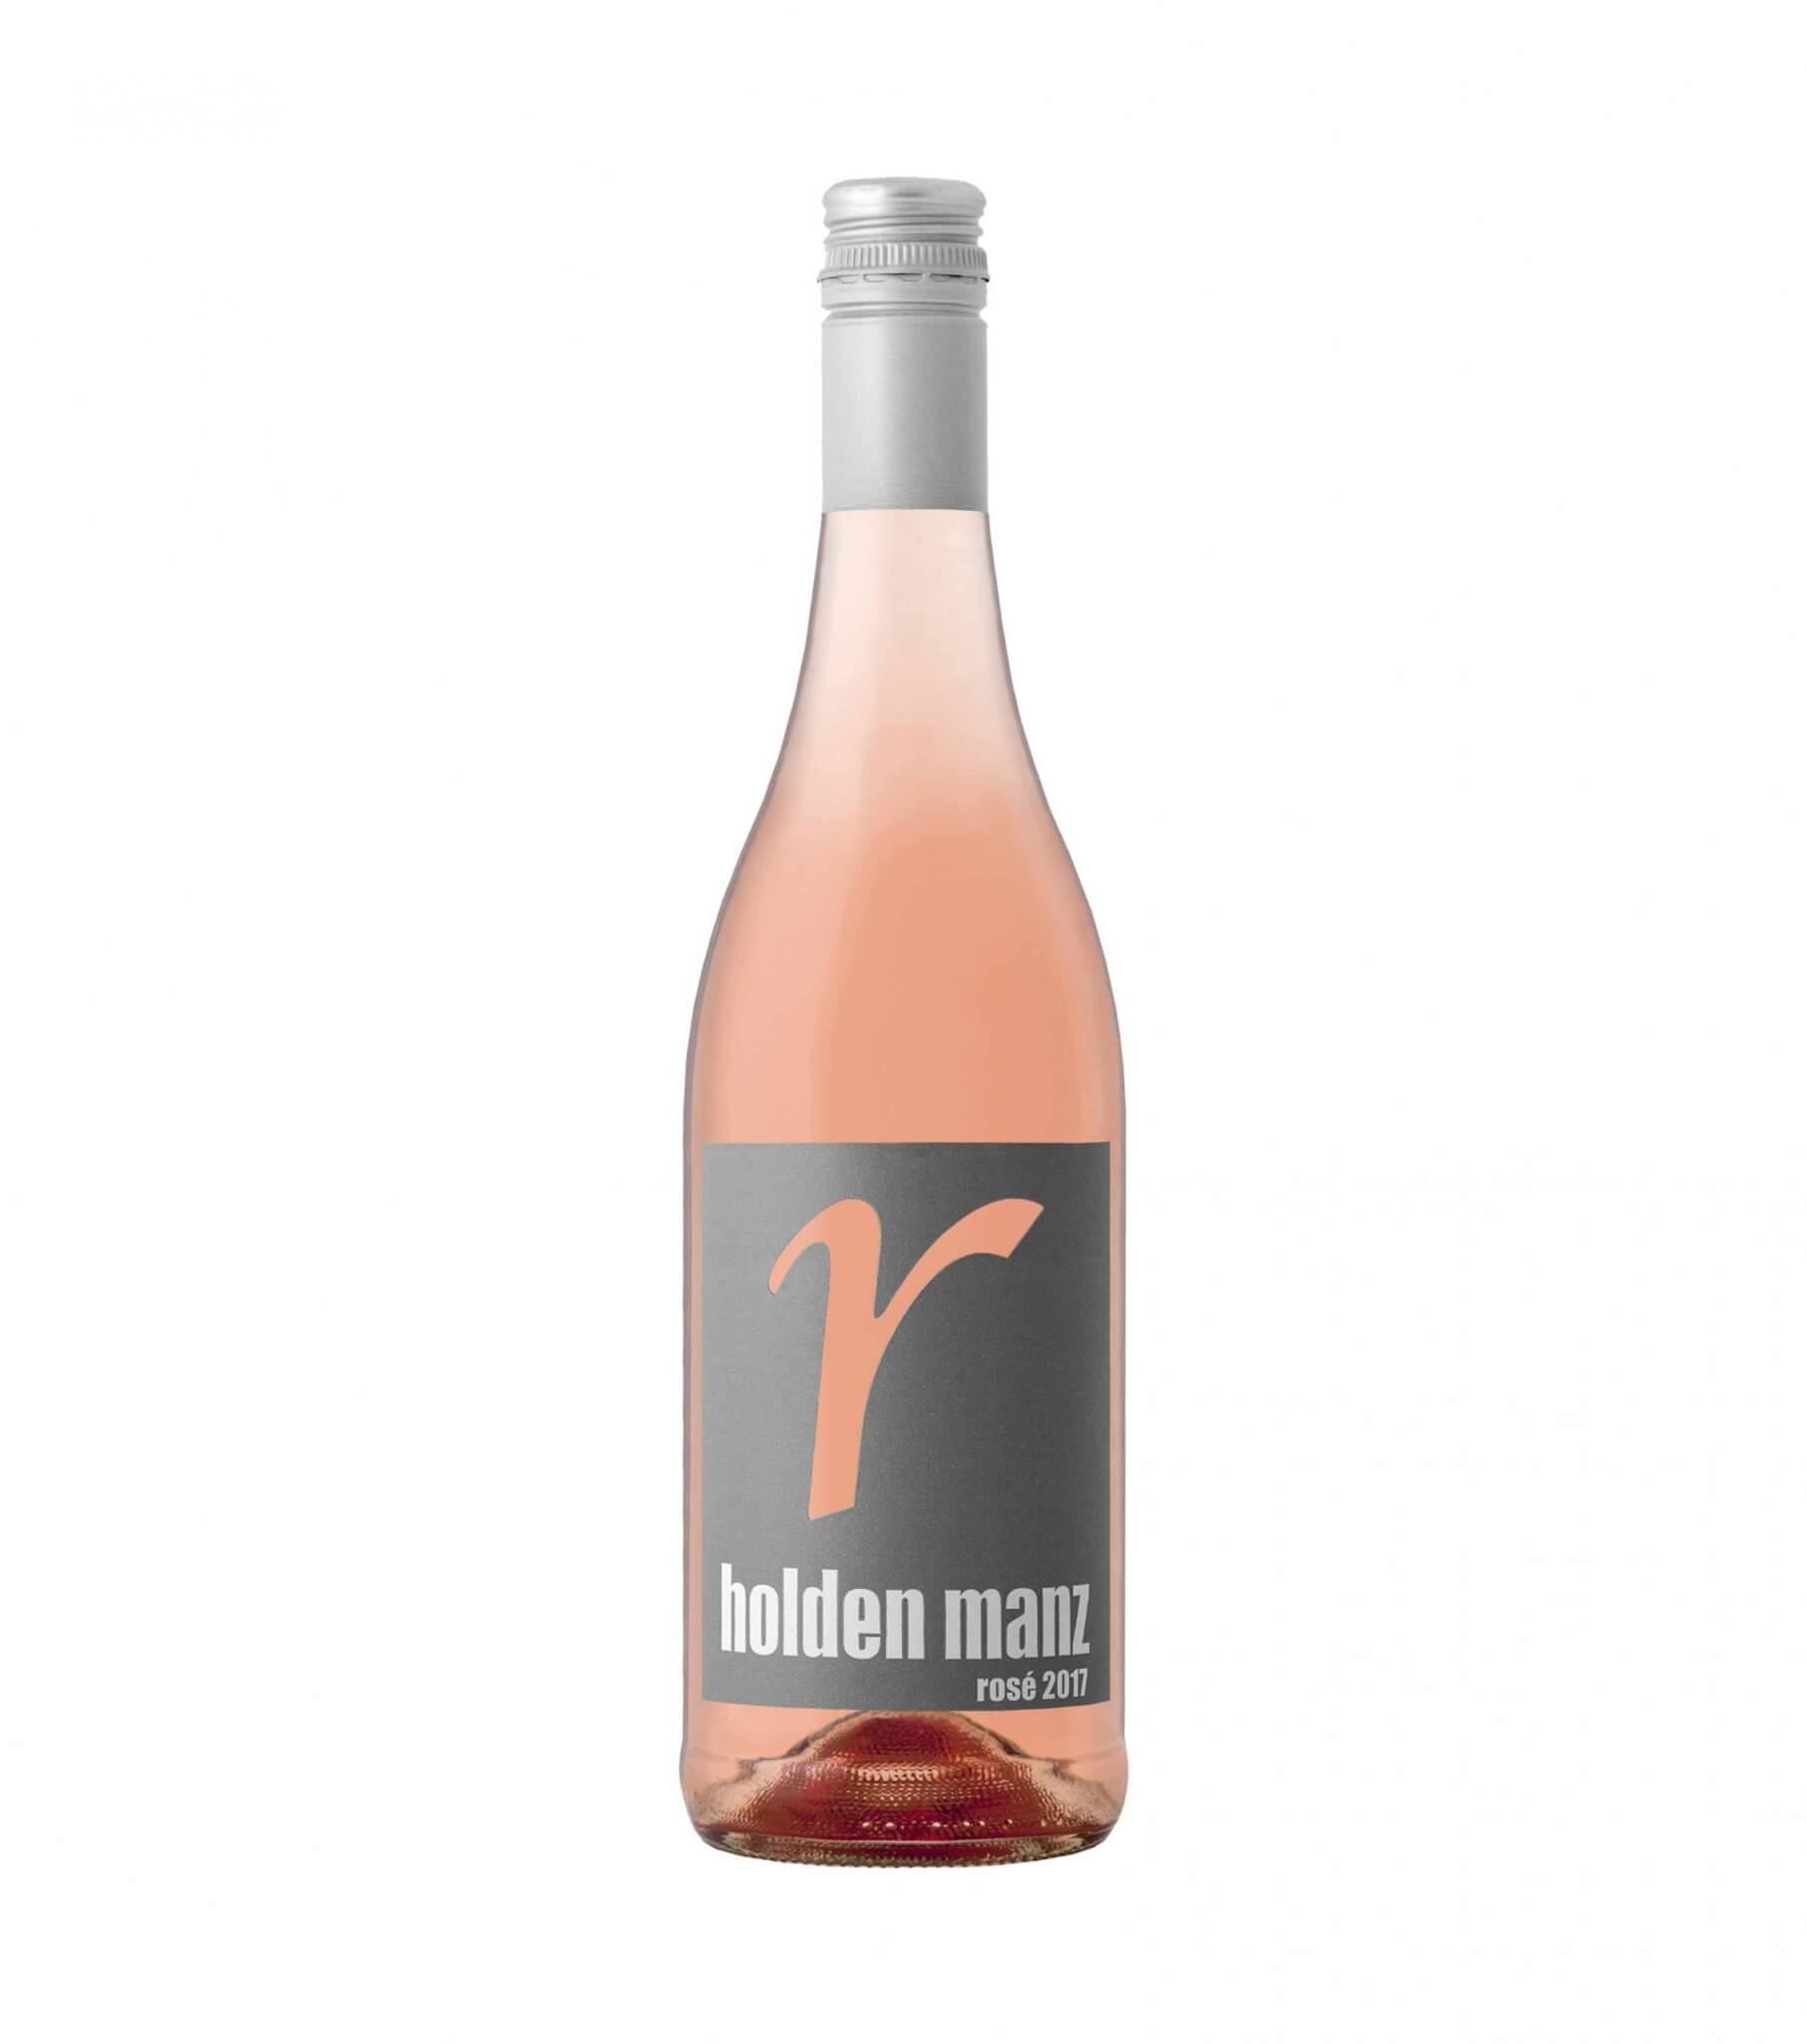 HOLDEN MANZ ROSE vegan wine 2016